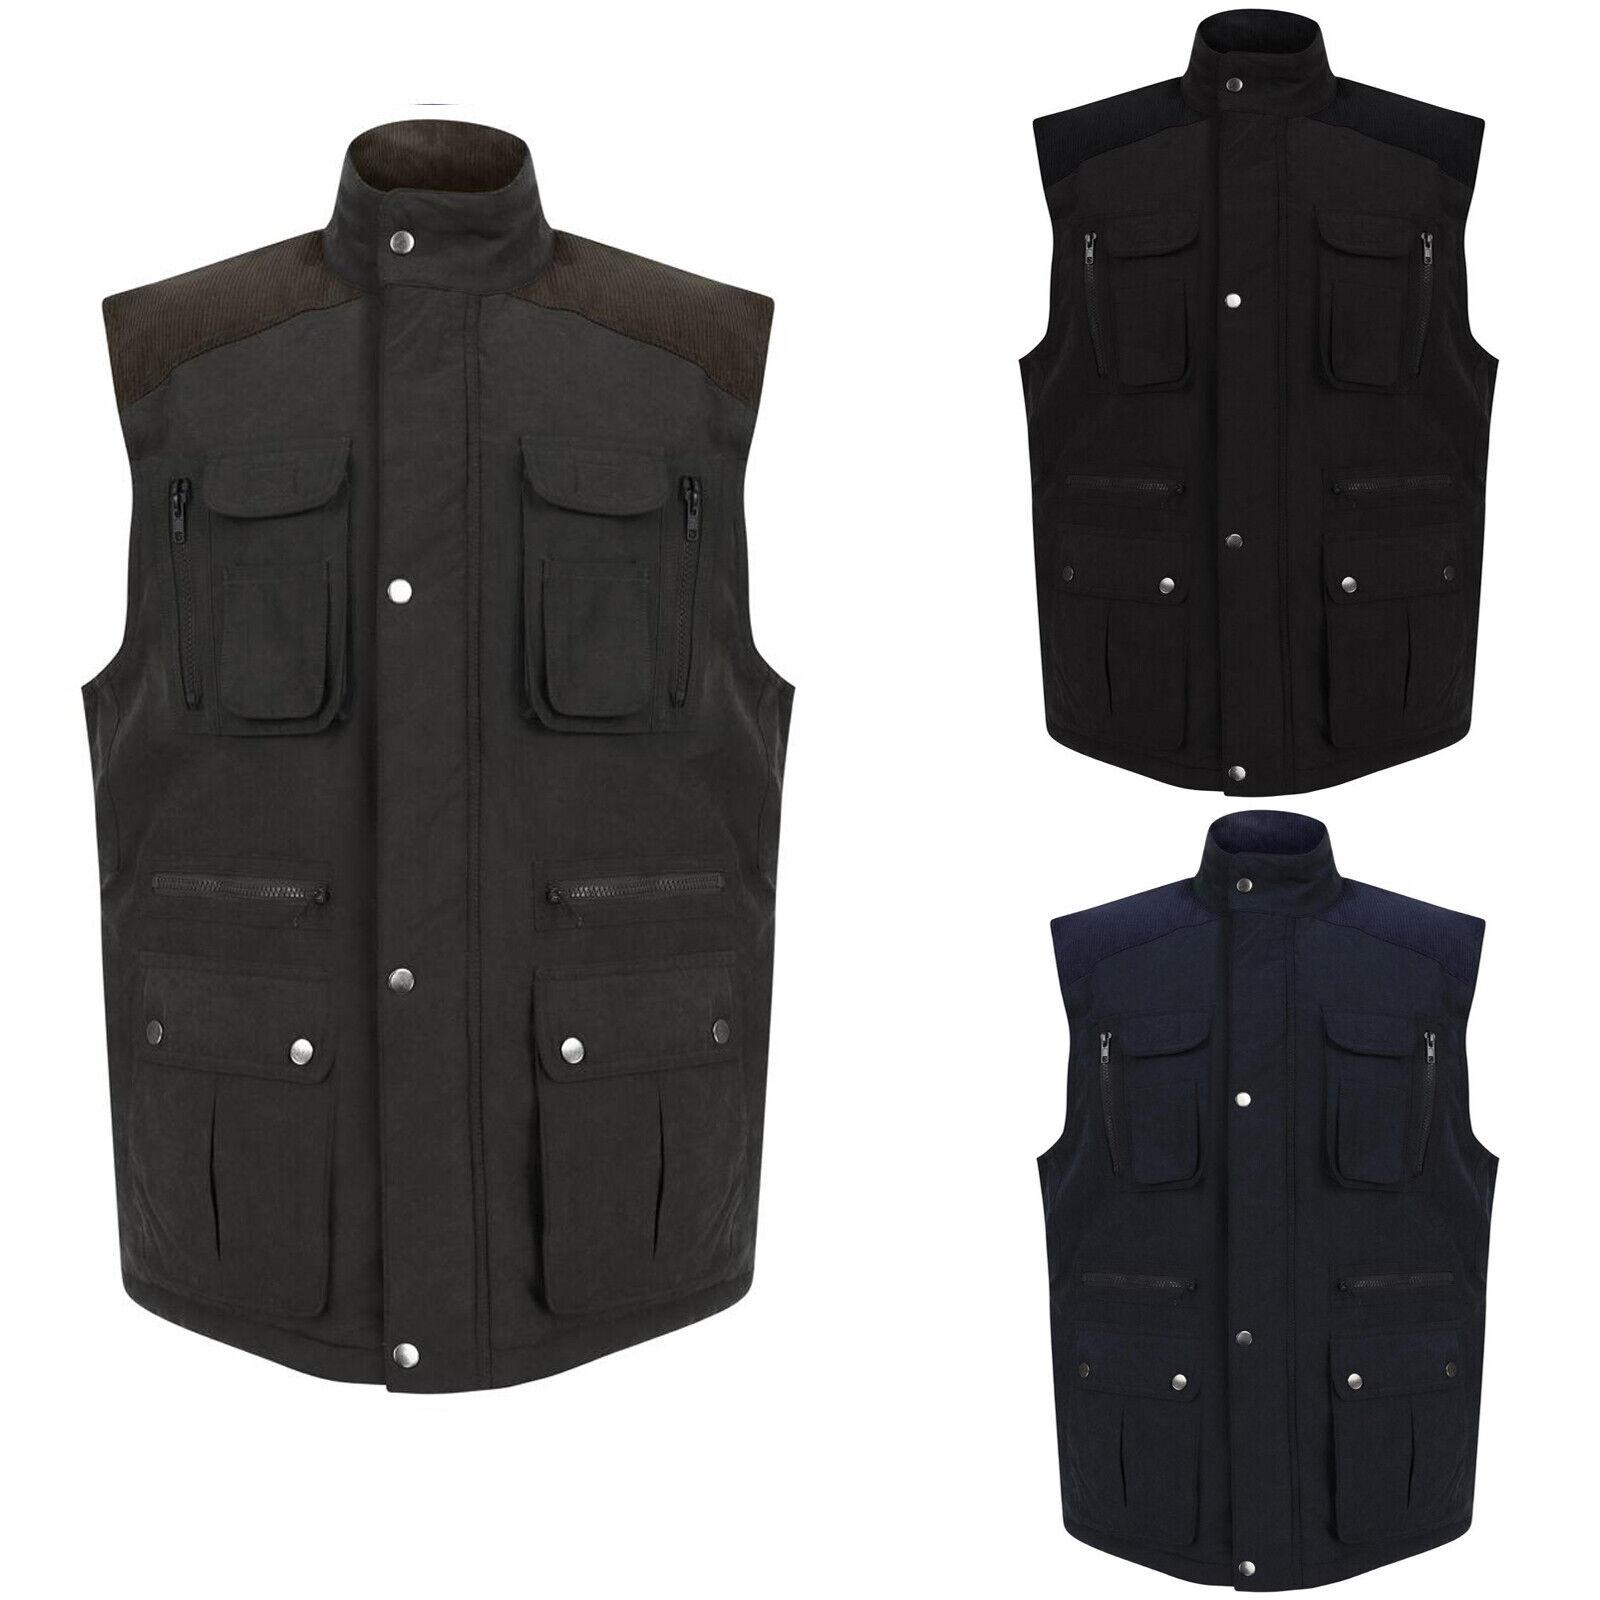 Mens Gilet Body Warmer Warm Winter Sleeveless Vest Waistcoat